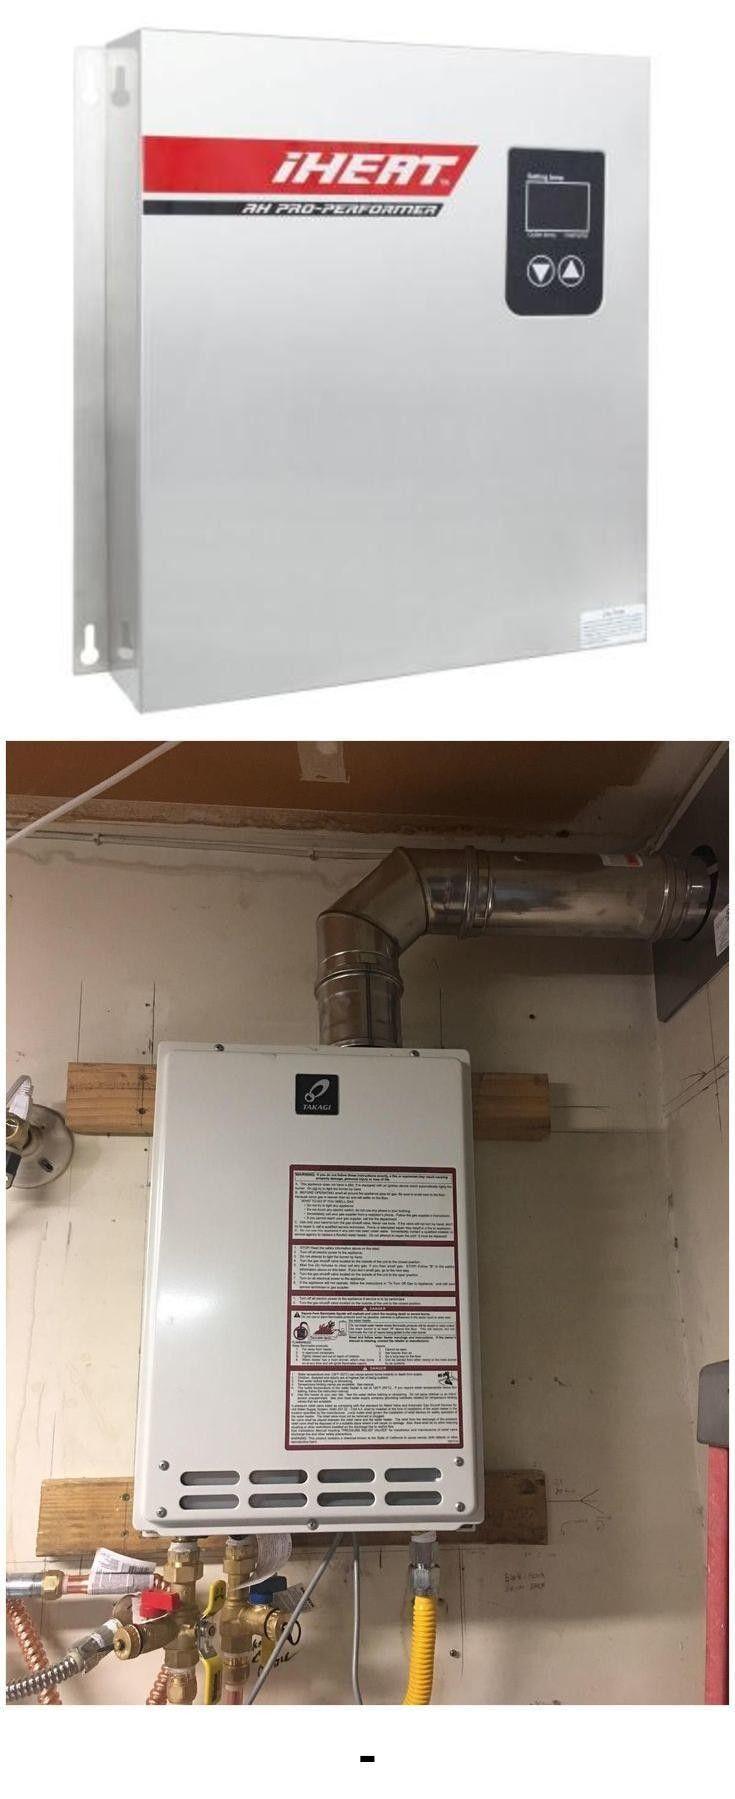 Attic Access Door How To Steam Vegetables Mutter Kids Attic Tankless Water Heater Water Heater Attic Access Door